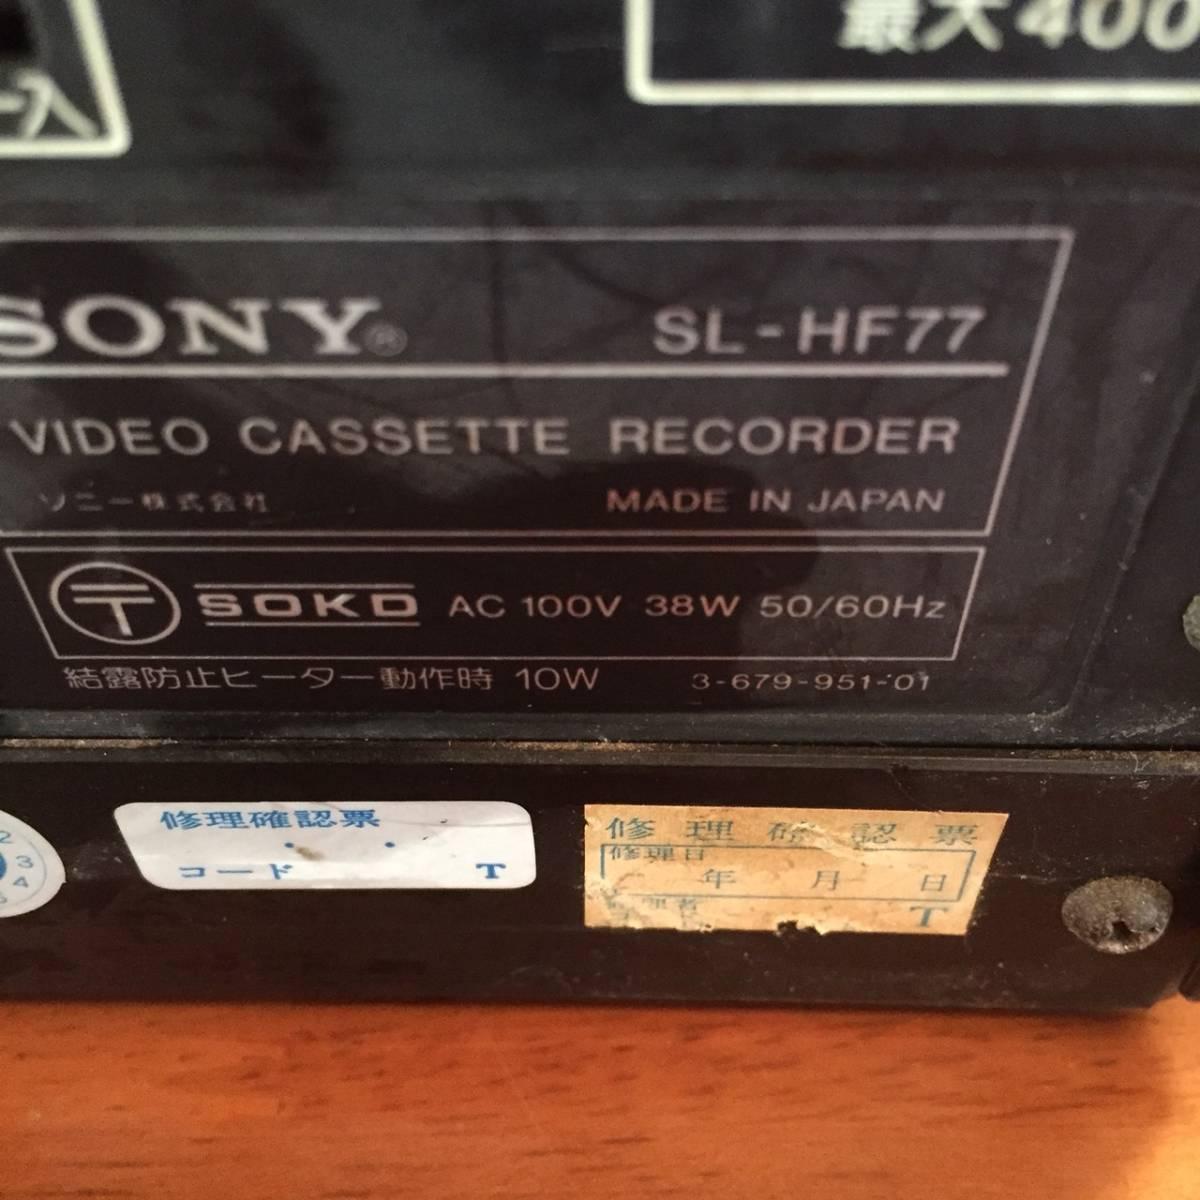 O1-567-0818 SONY Beta ベータビデオデッキ Hi-Fi SL-HF77 通電確認のみなので、ジャンク出品_画像10